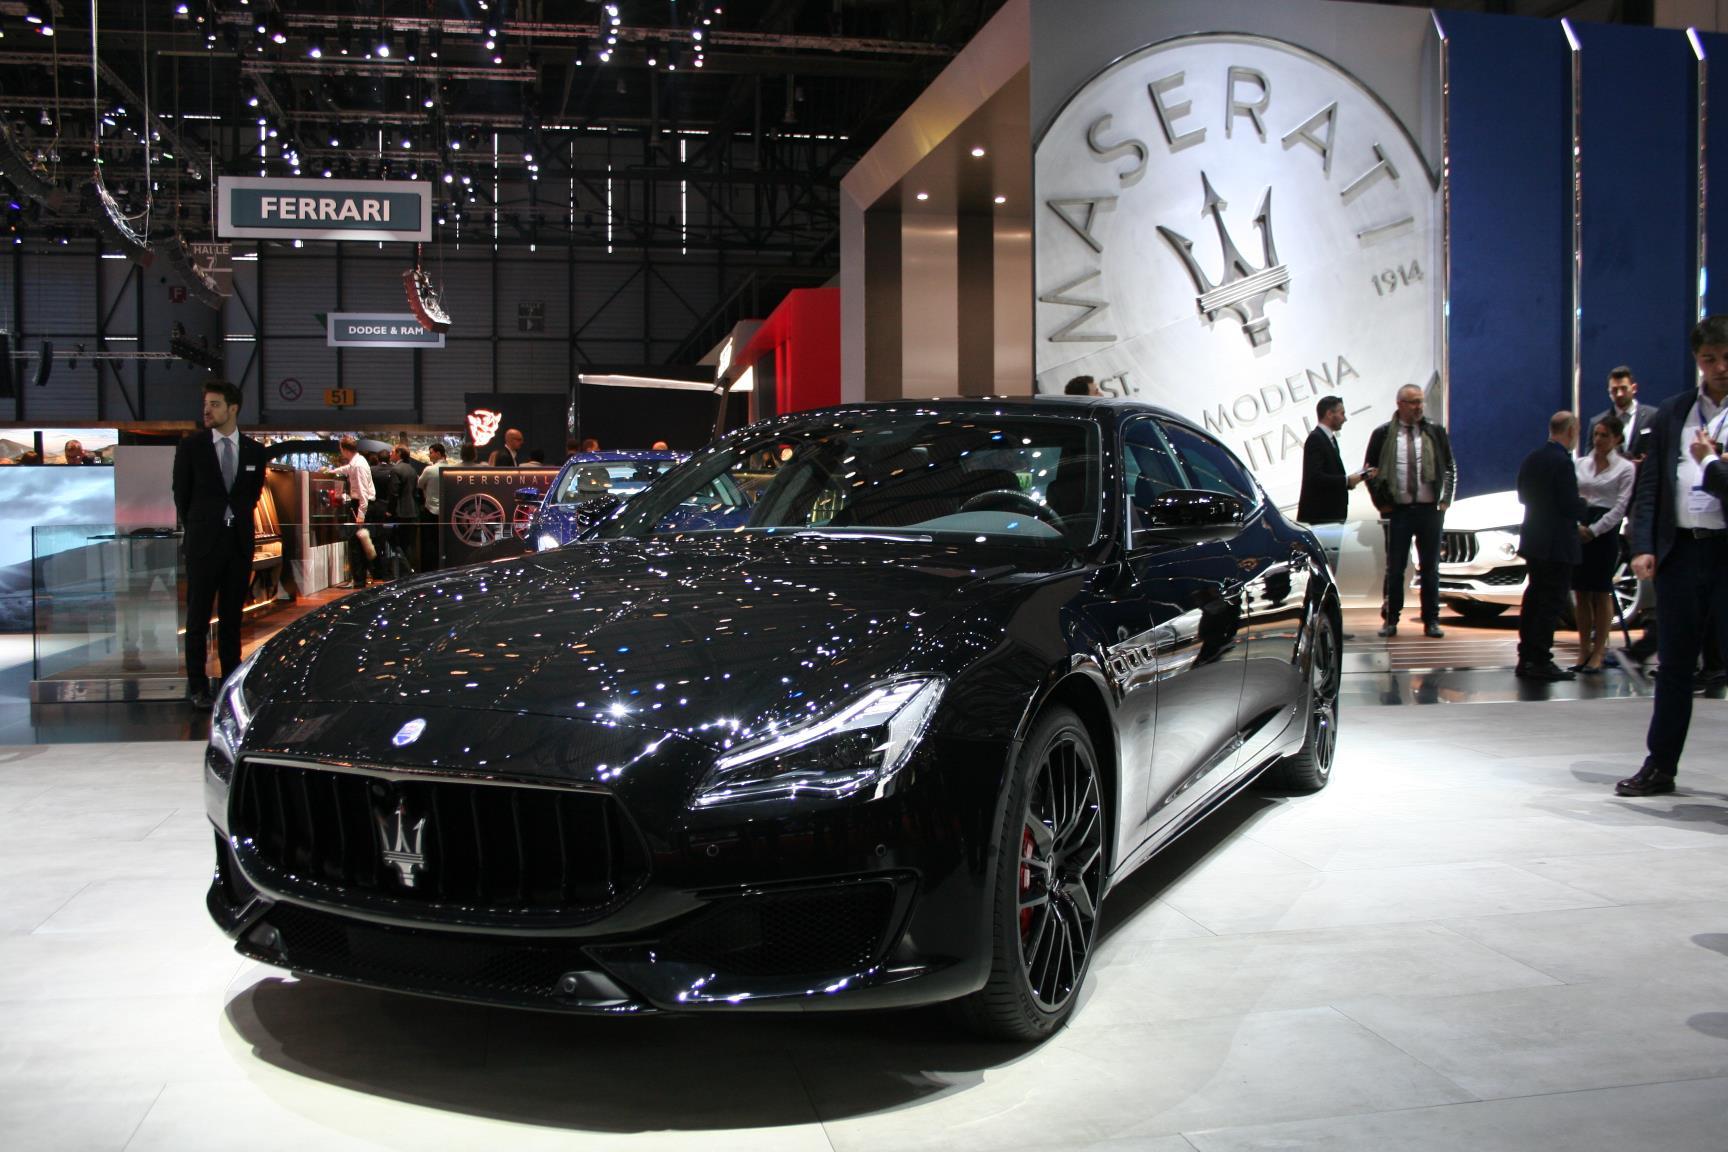 Geneva Motor Show 2018 Mega Gallery Part 1 (170)